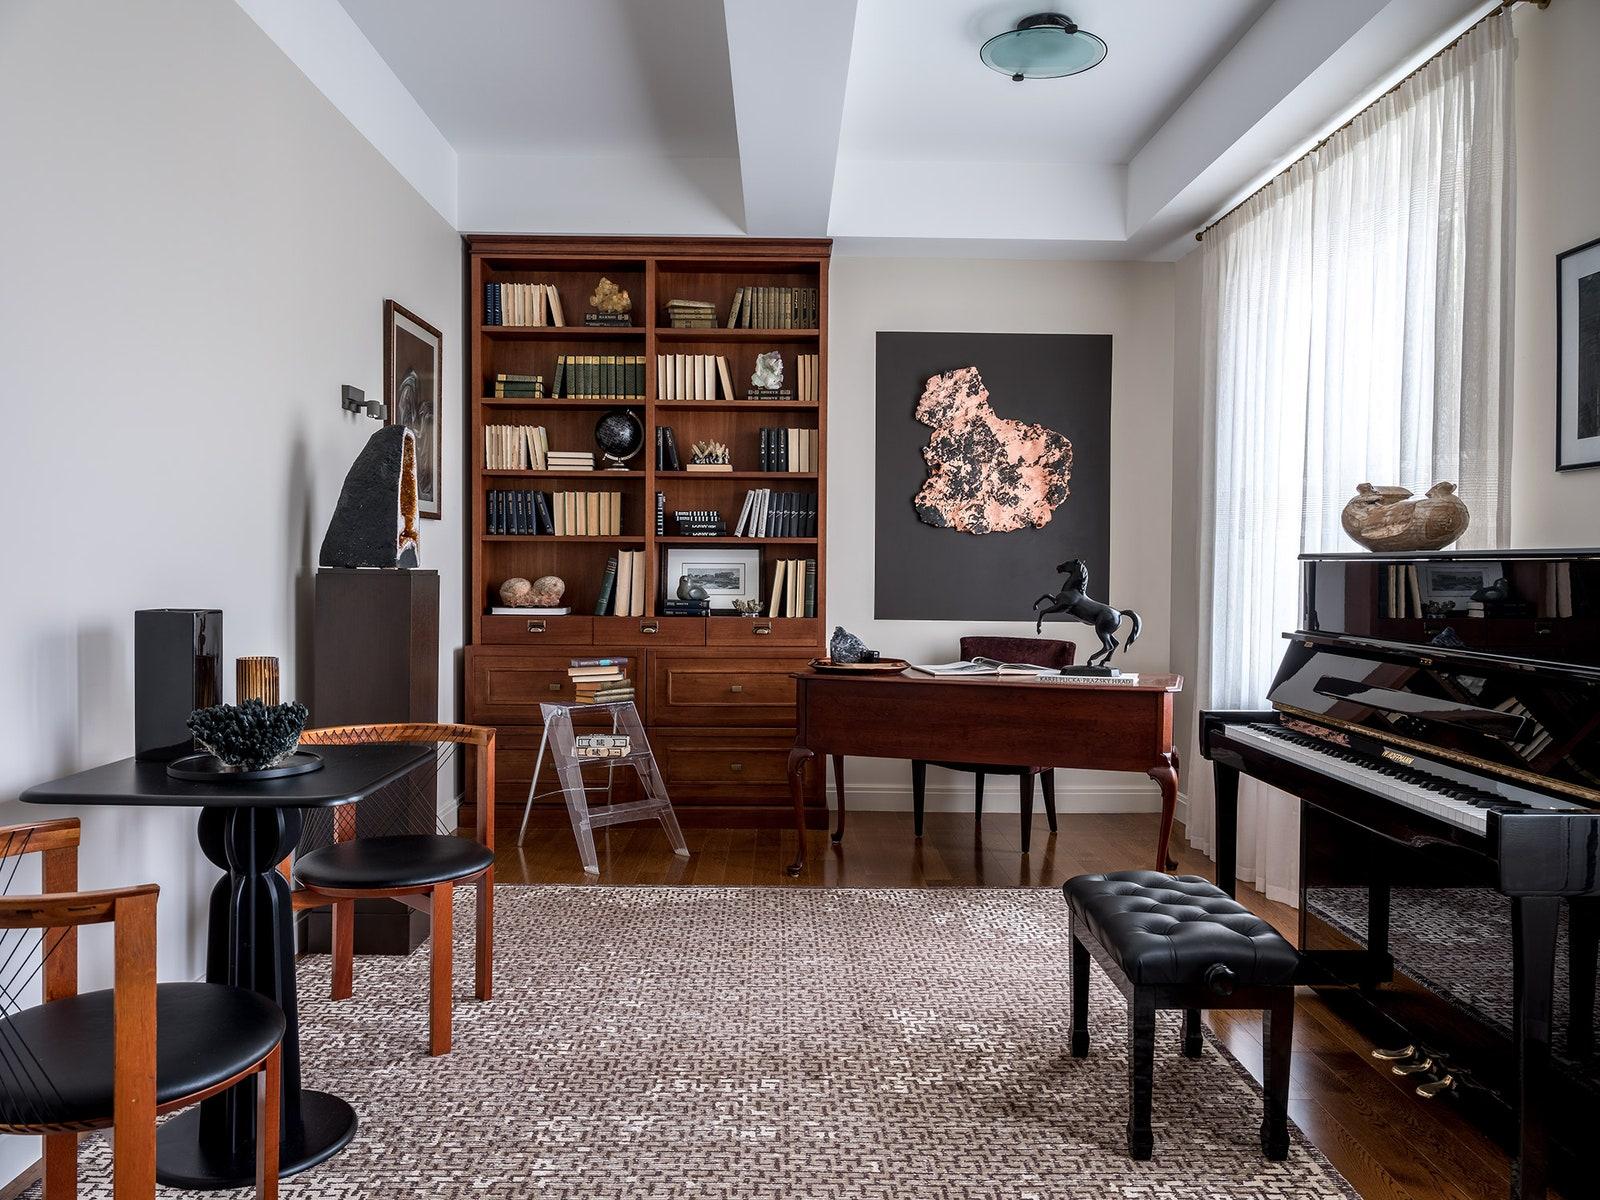 .  c  Short Way  Kartell   Unika Mblar   String Chairs by Niels J. Haugesen   Lamps of 506070s  Art de Vivre ...